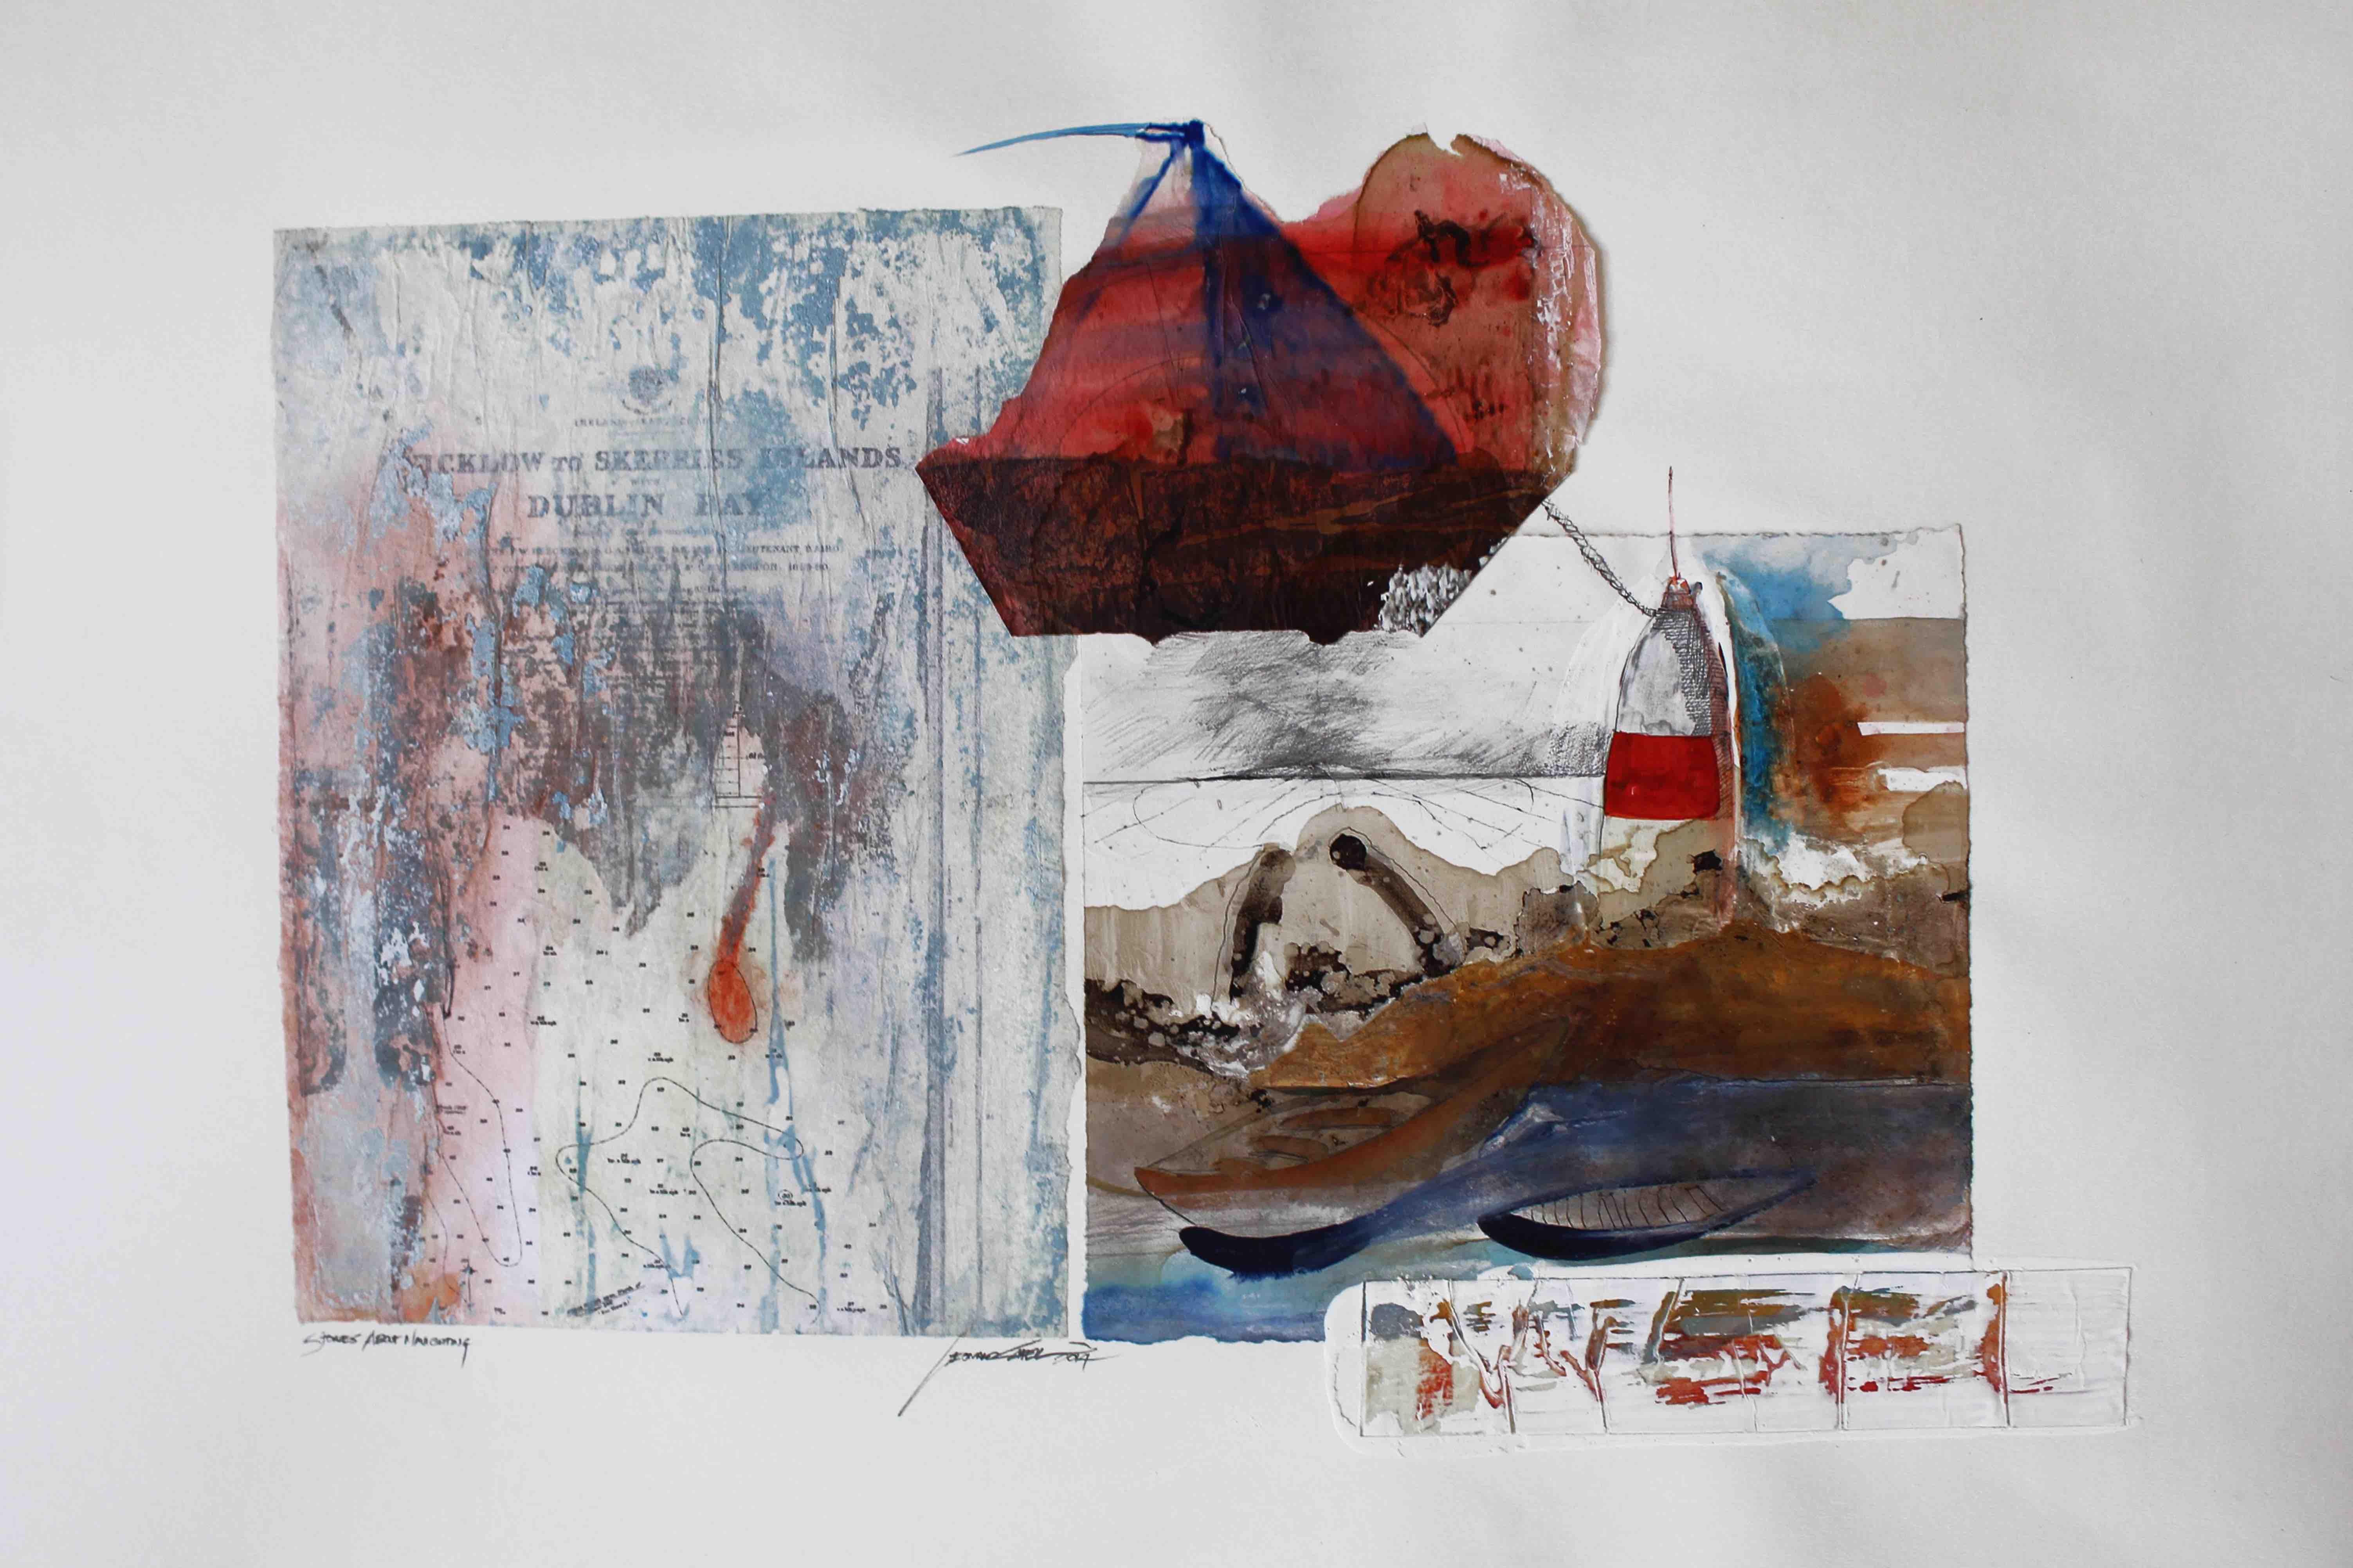 Leonard Sheil: Insel No.1, 2014/14